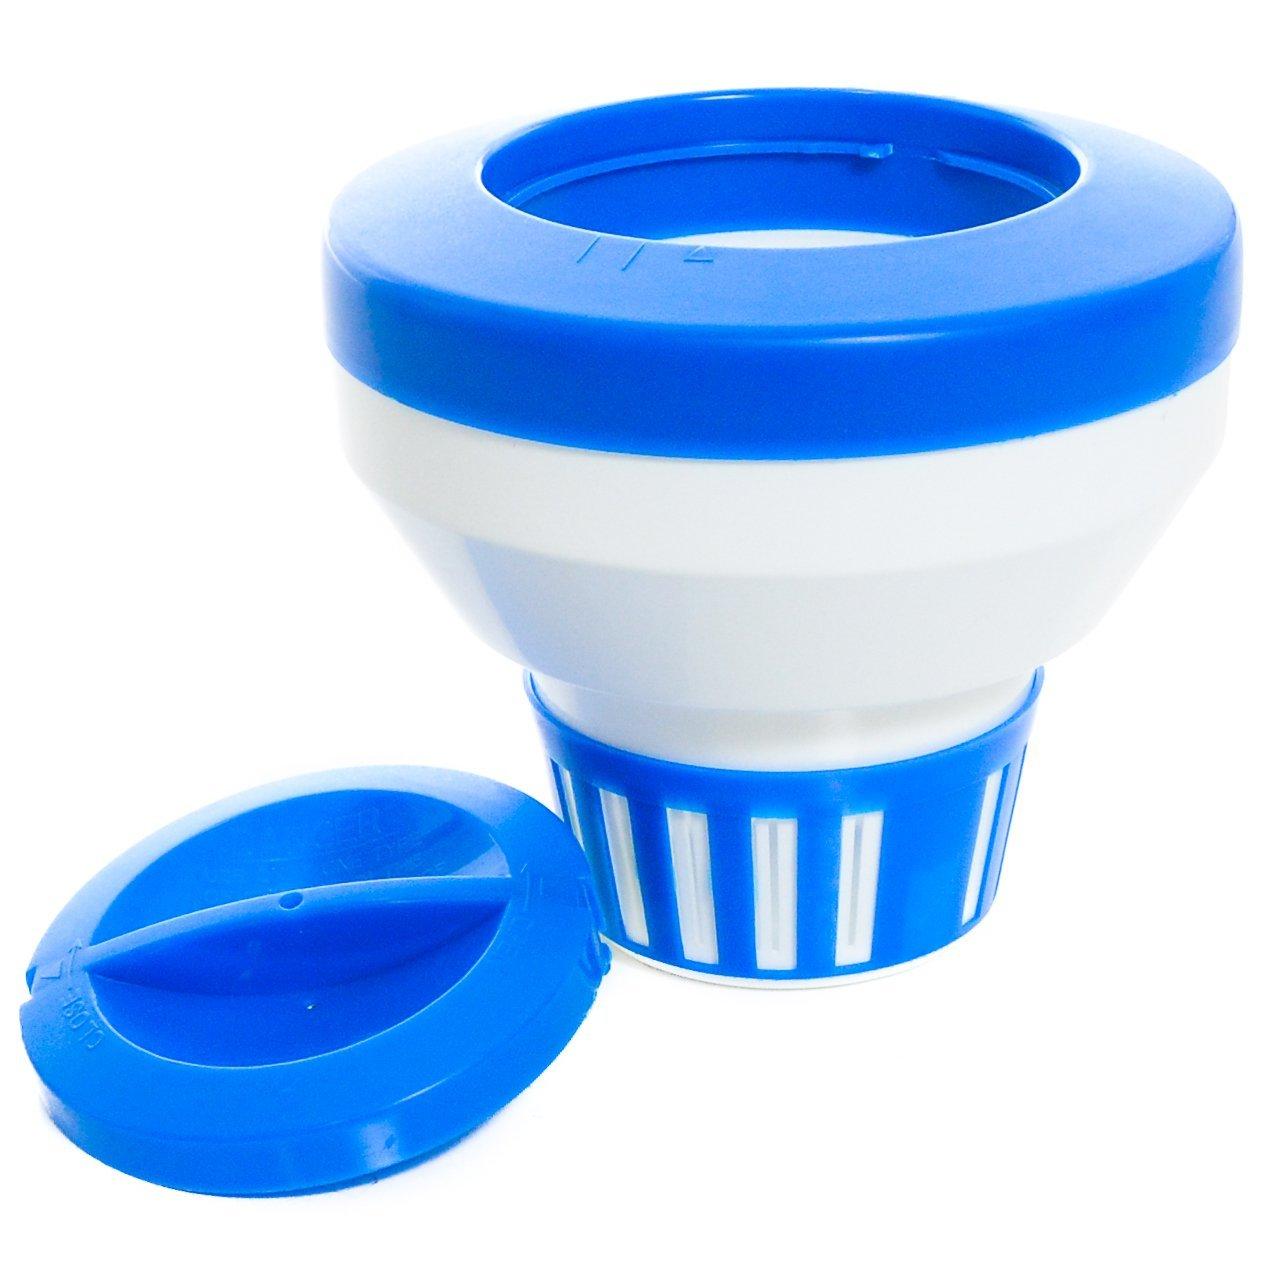 Review of Milliard Chlorine Floater, Floating Chlorine Dispenser